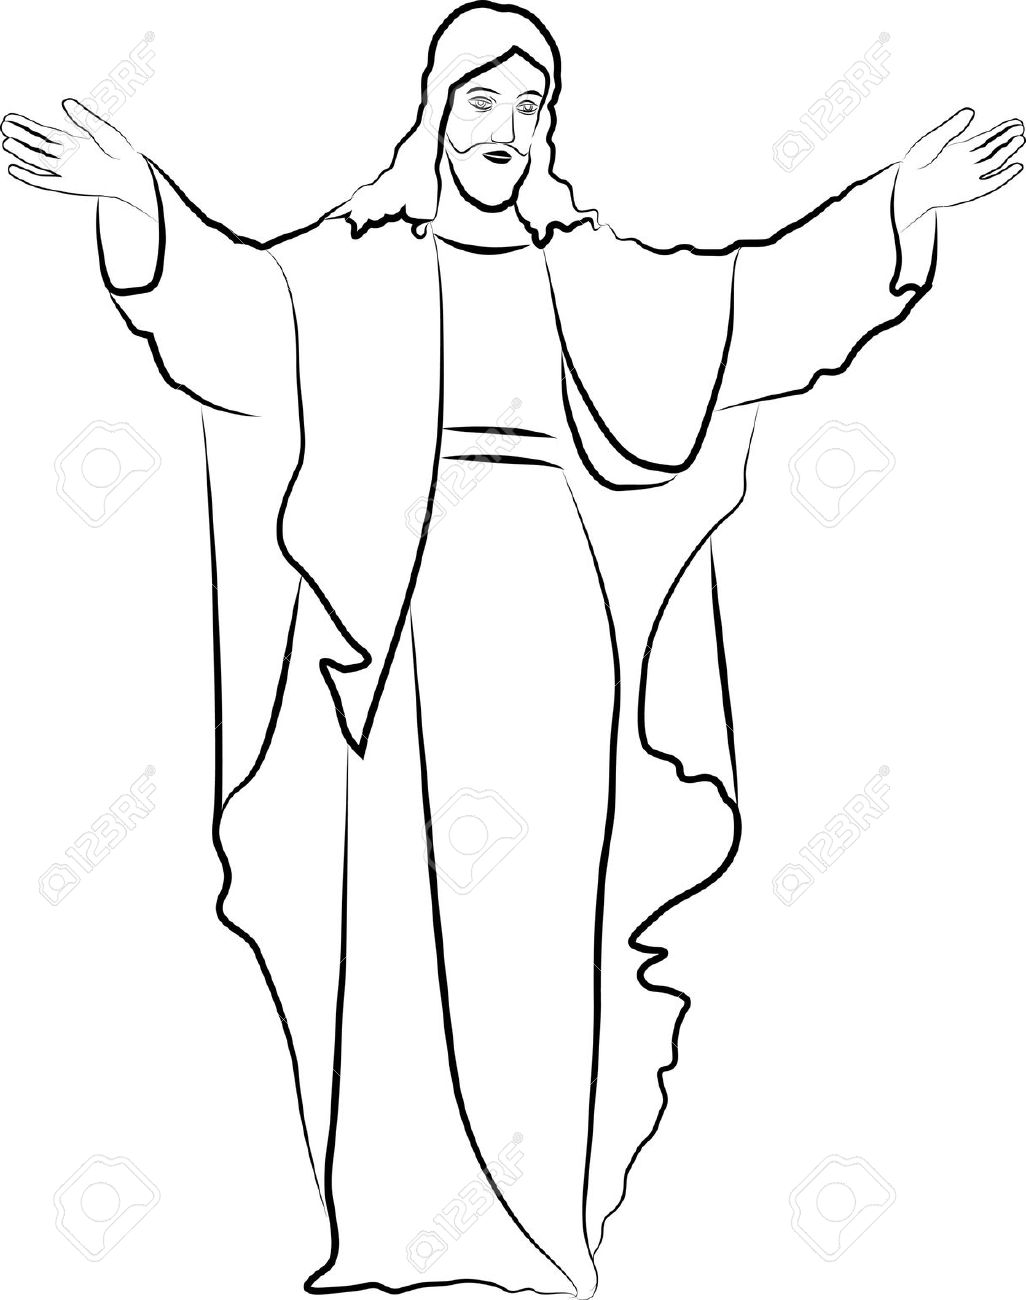 Line Drawing Jesus Christ : Desenho de jesus cristo